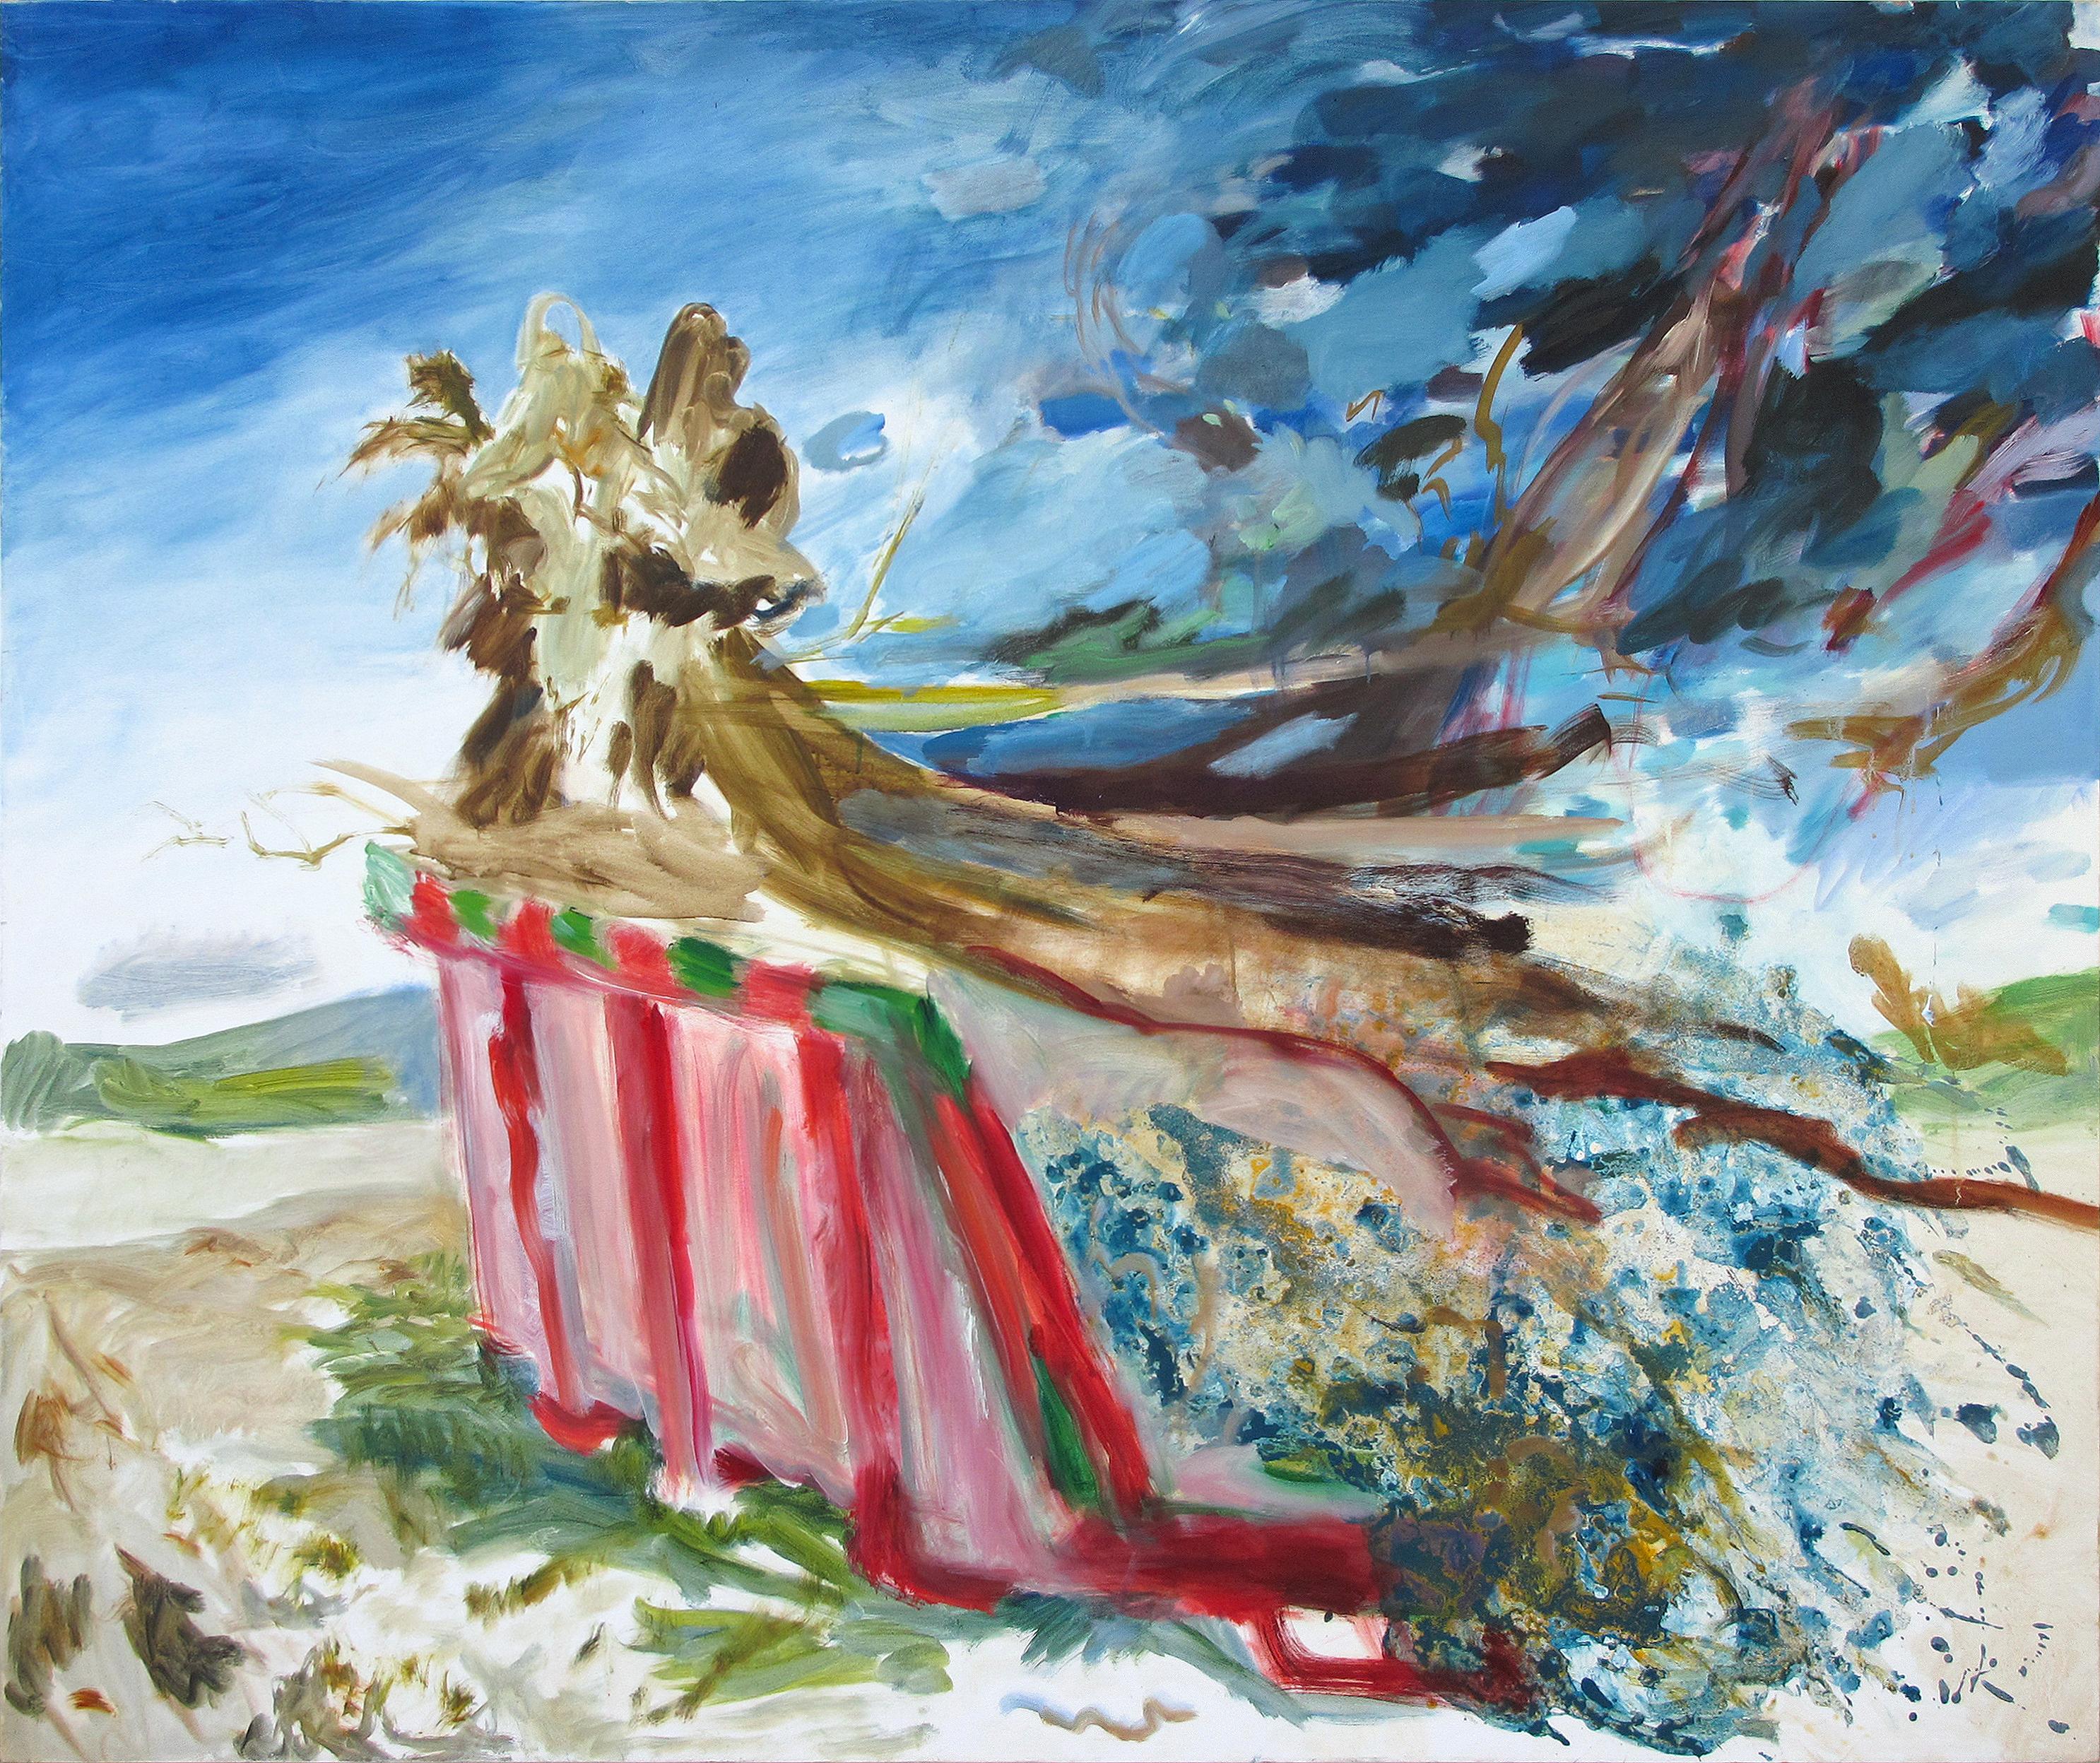 Suzanna Treumann | Daphne, dumped, Öl und Acylic auf leinwand, 150 x 180 cm 2008-2011